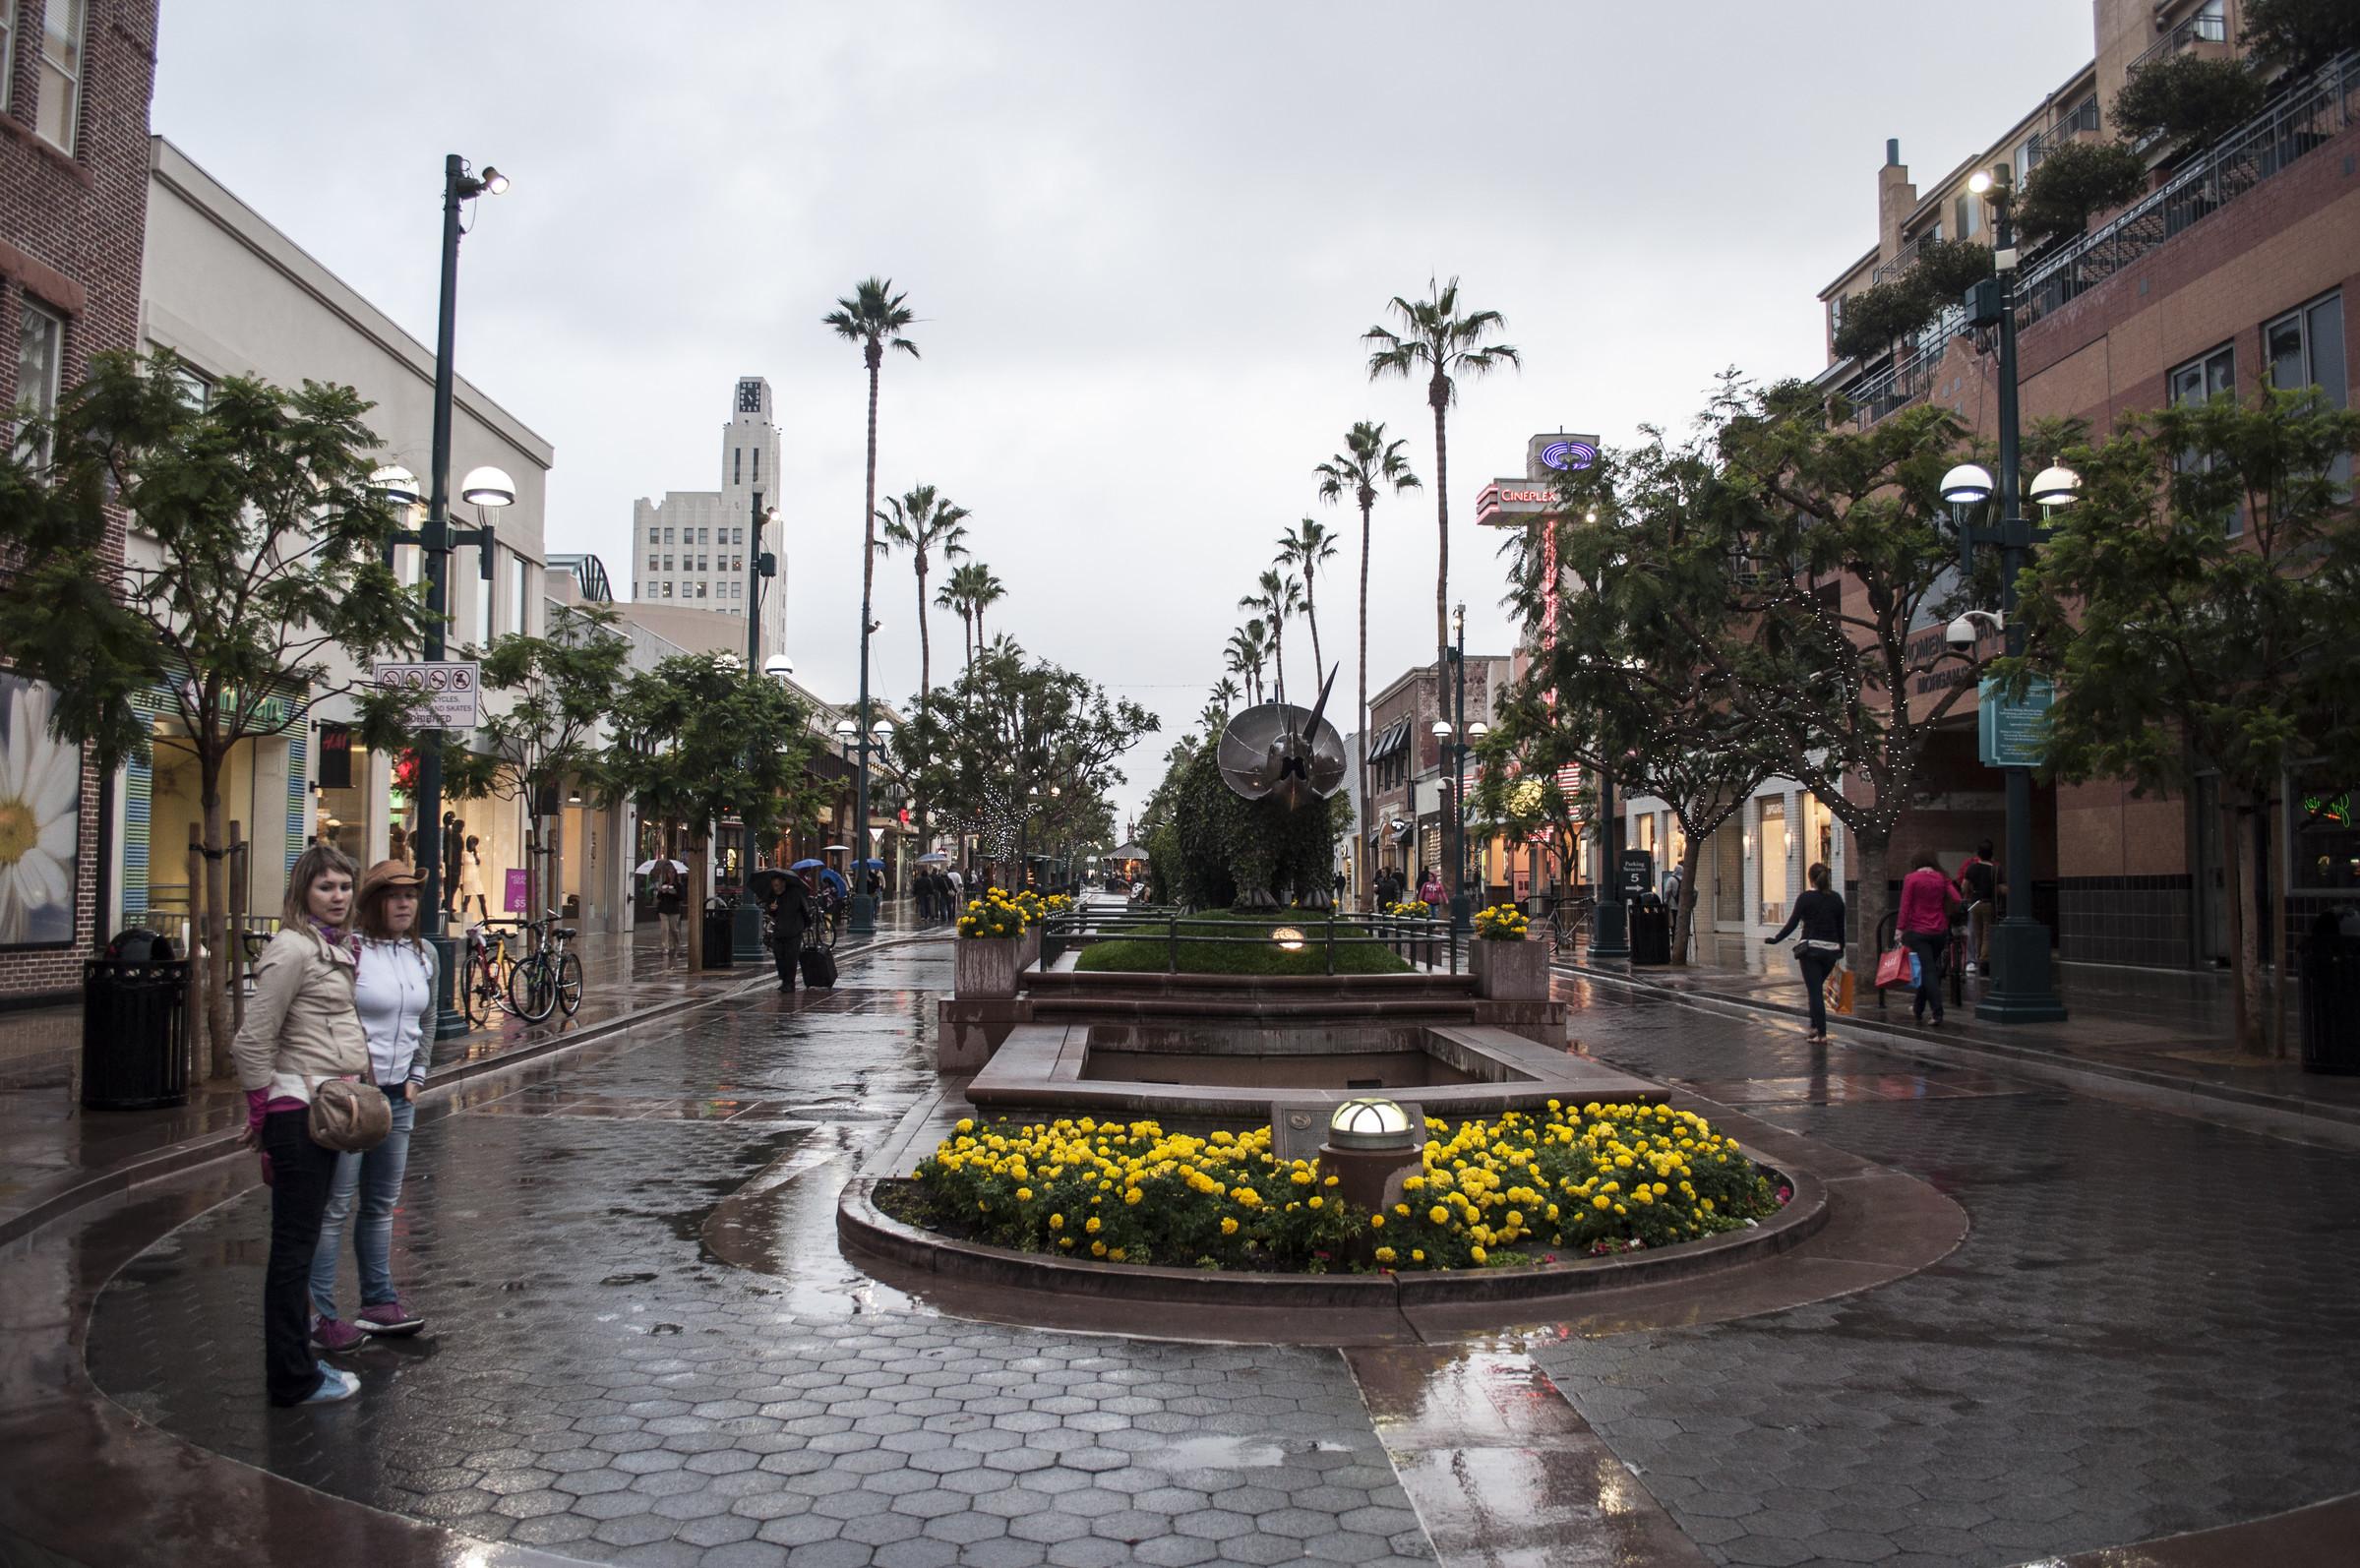 лос анджелес фото туристов популярны